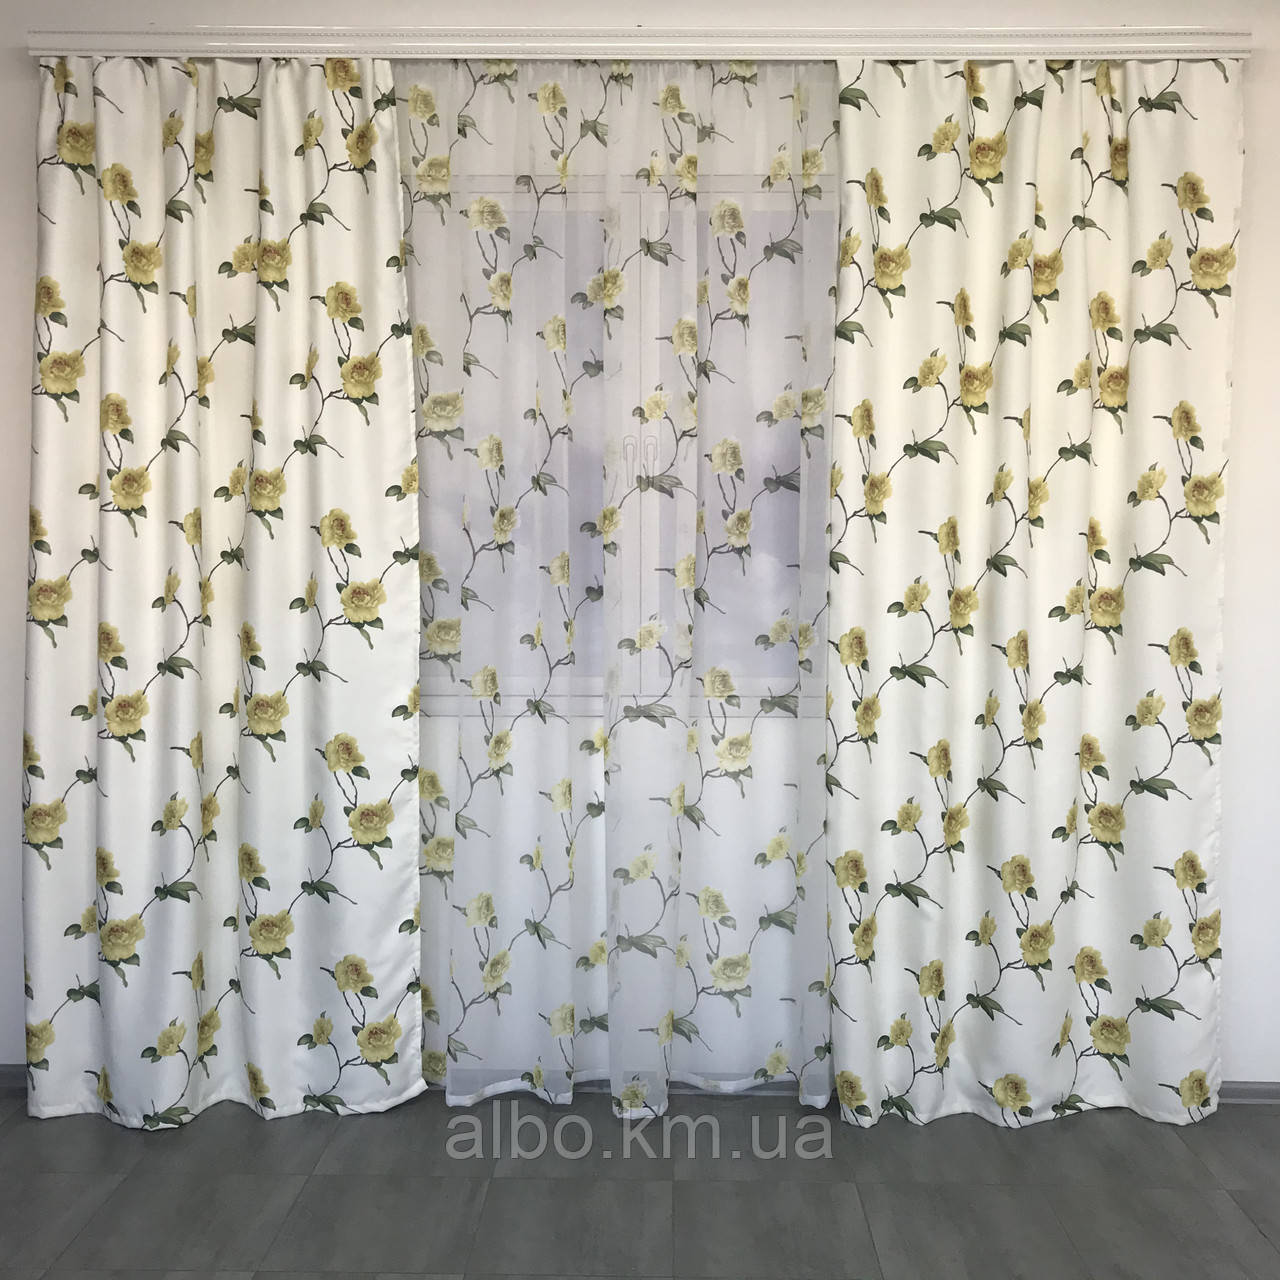 Готовые атласные шторы 150x270 cm (2 шт) с тюлью 400x270 cm ALBO Желтые (SHT-614-4)